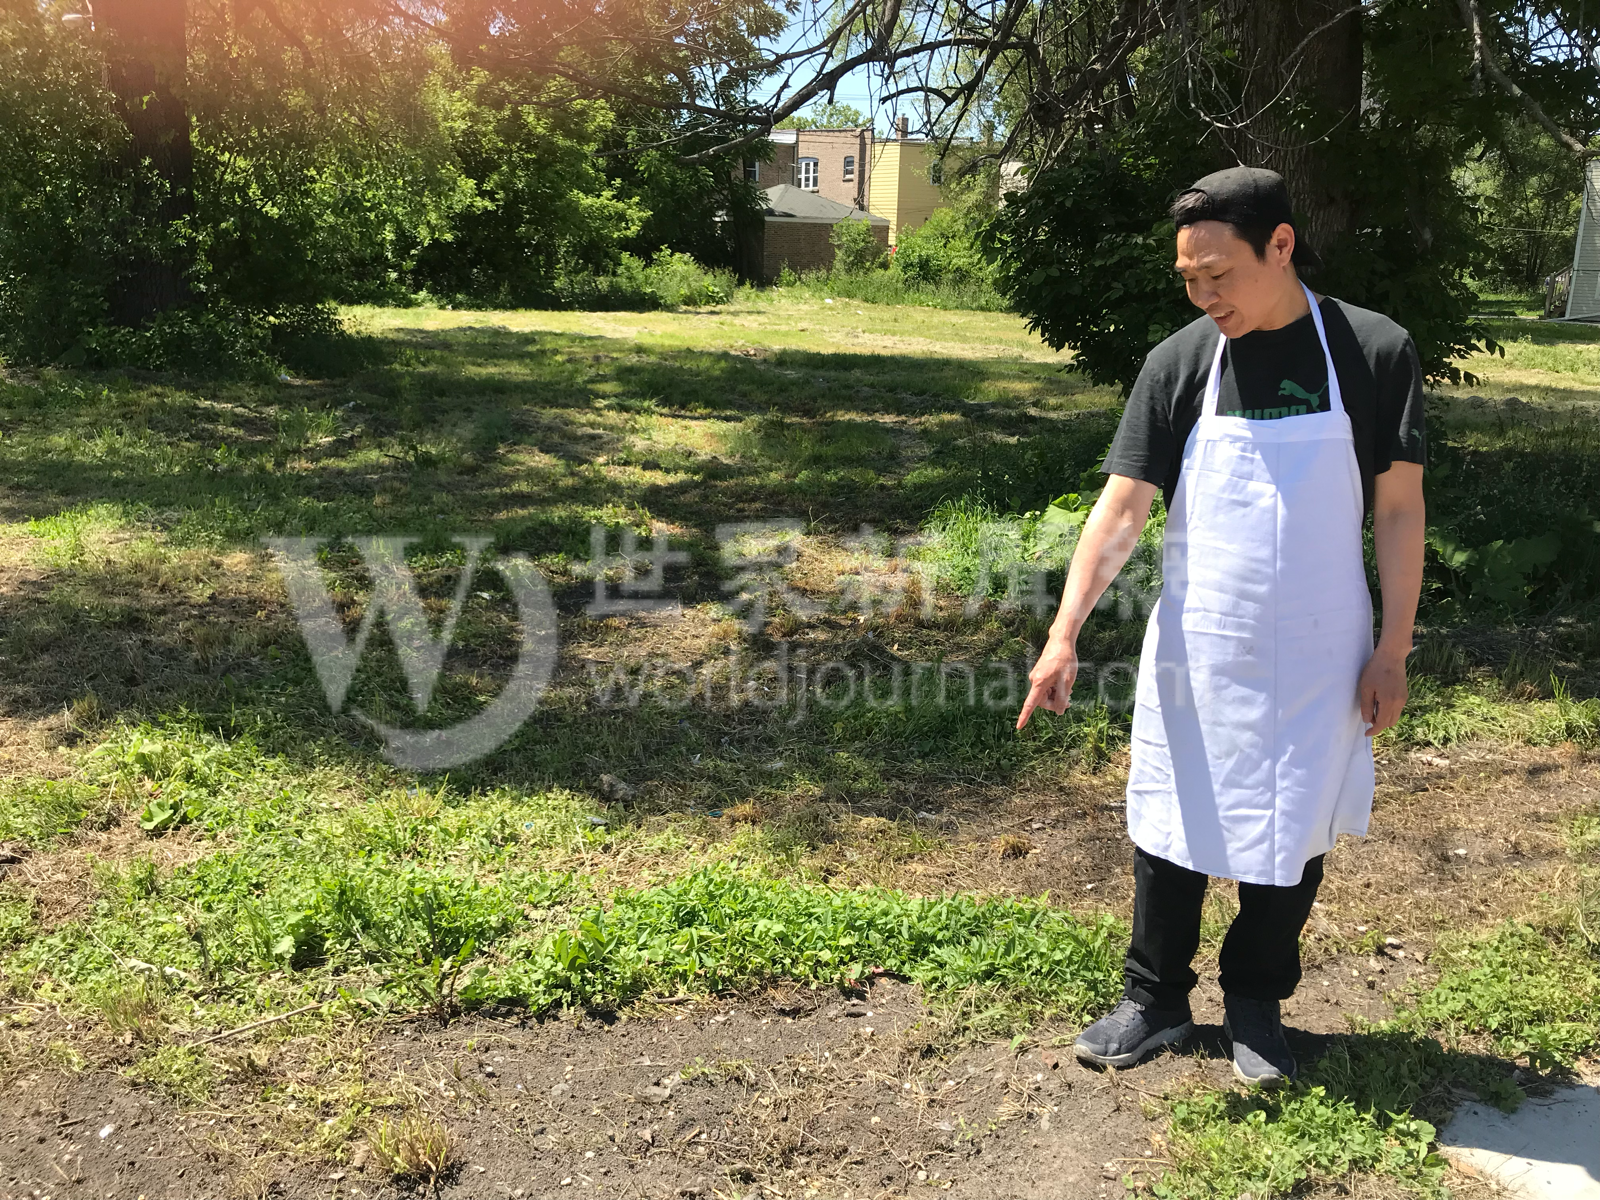 China City東主陳先生表示,影片拍攝當天,餐館員工從餐館後門對街的荒地上,挖了一些泥土,準備帶回家種花。(特派員黃惠玲/攝影)